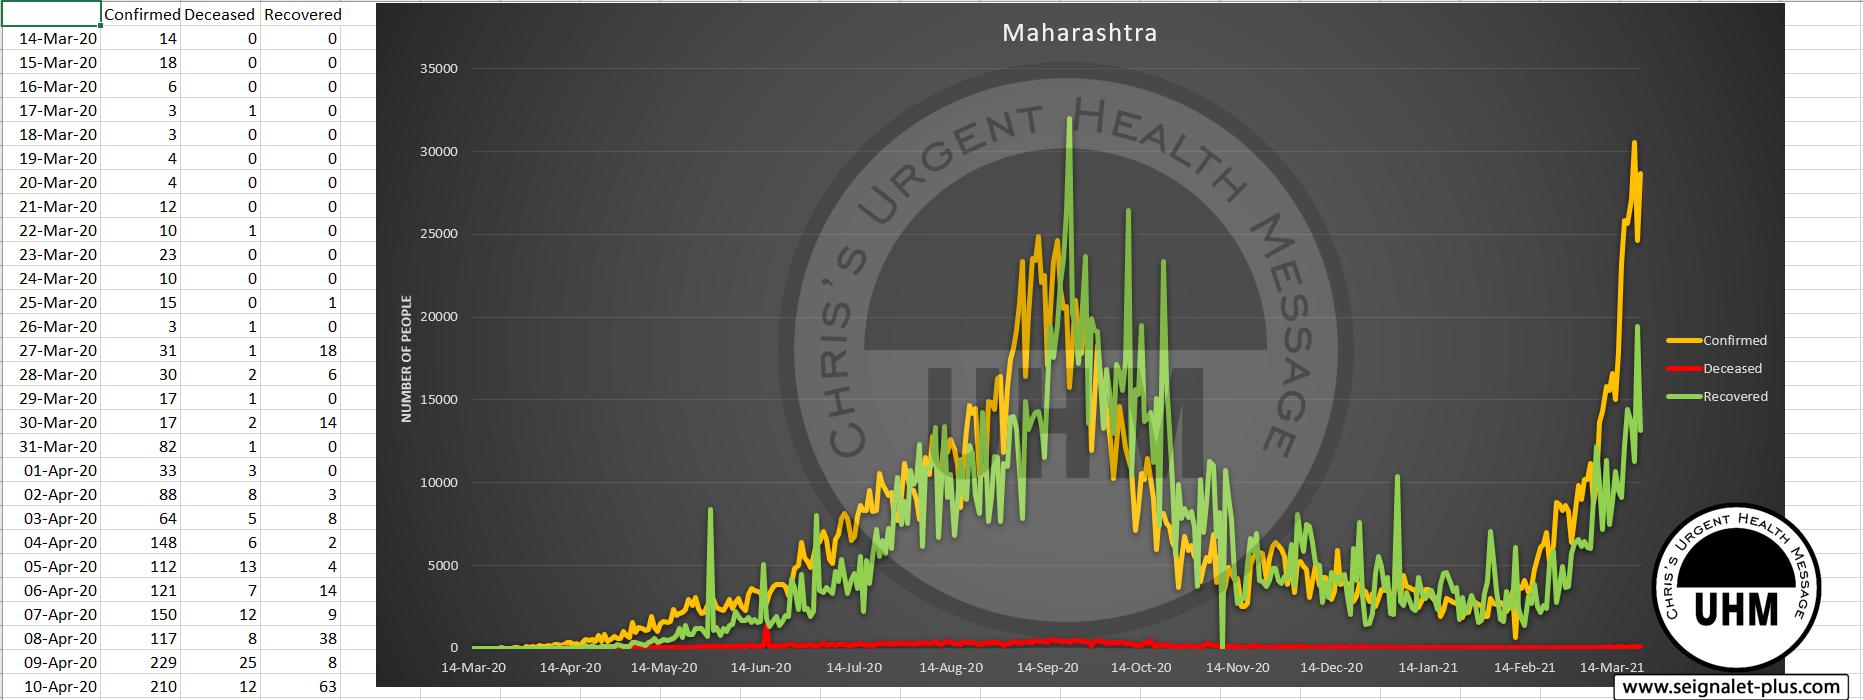 Vitamin d deficient Maharashstra state